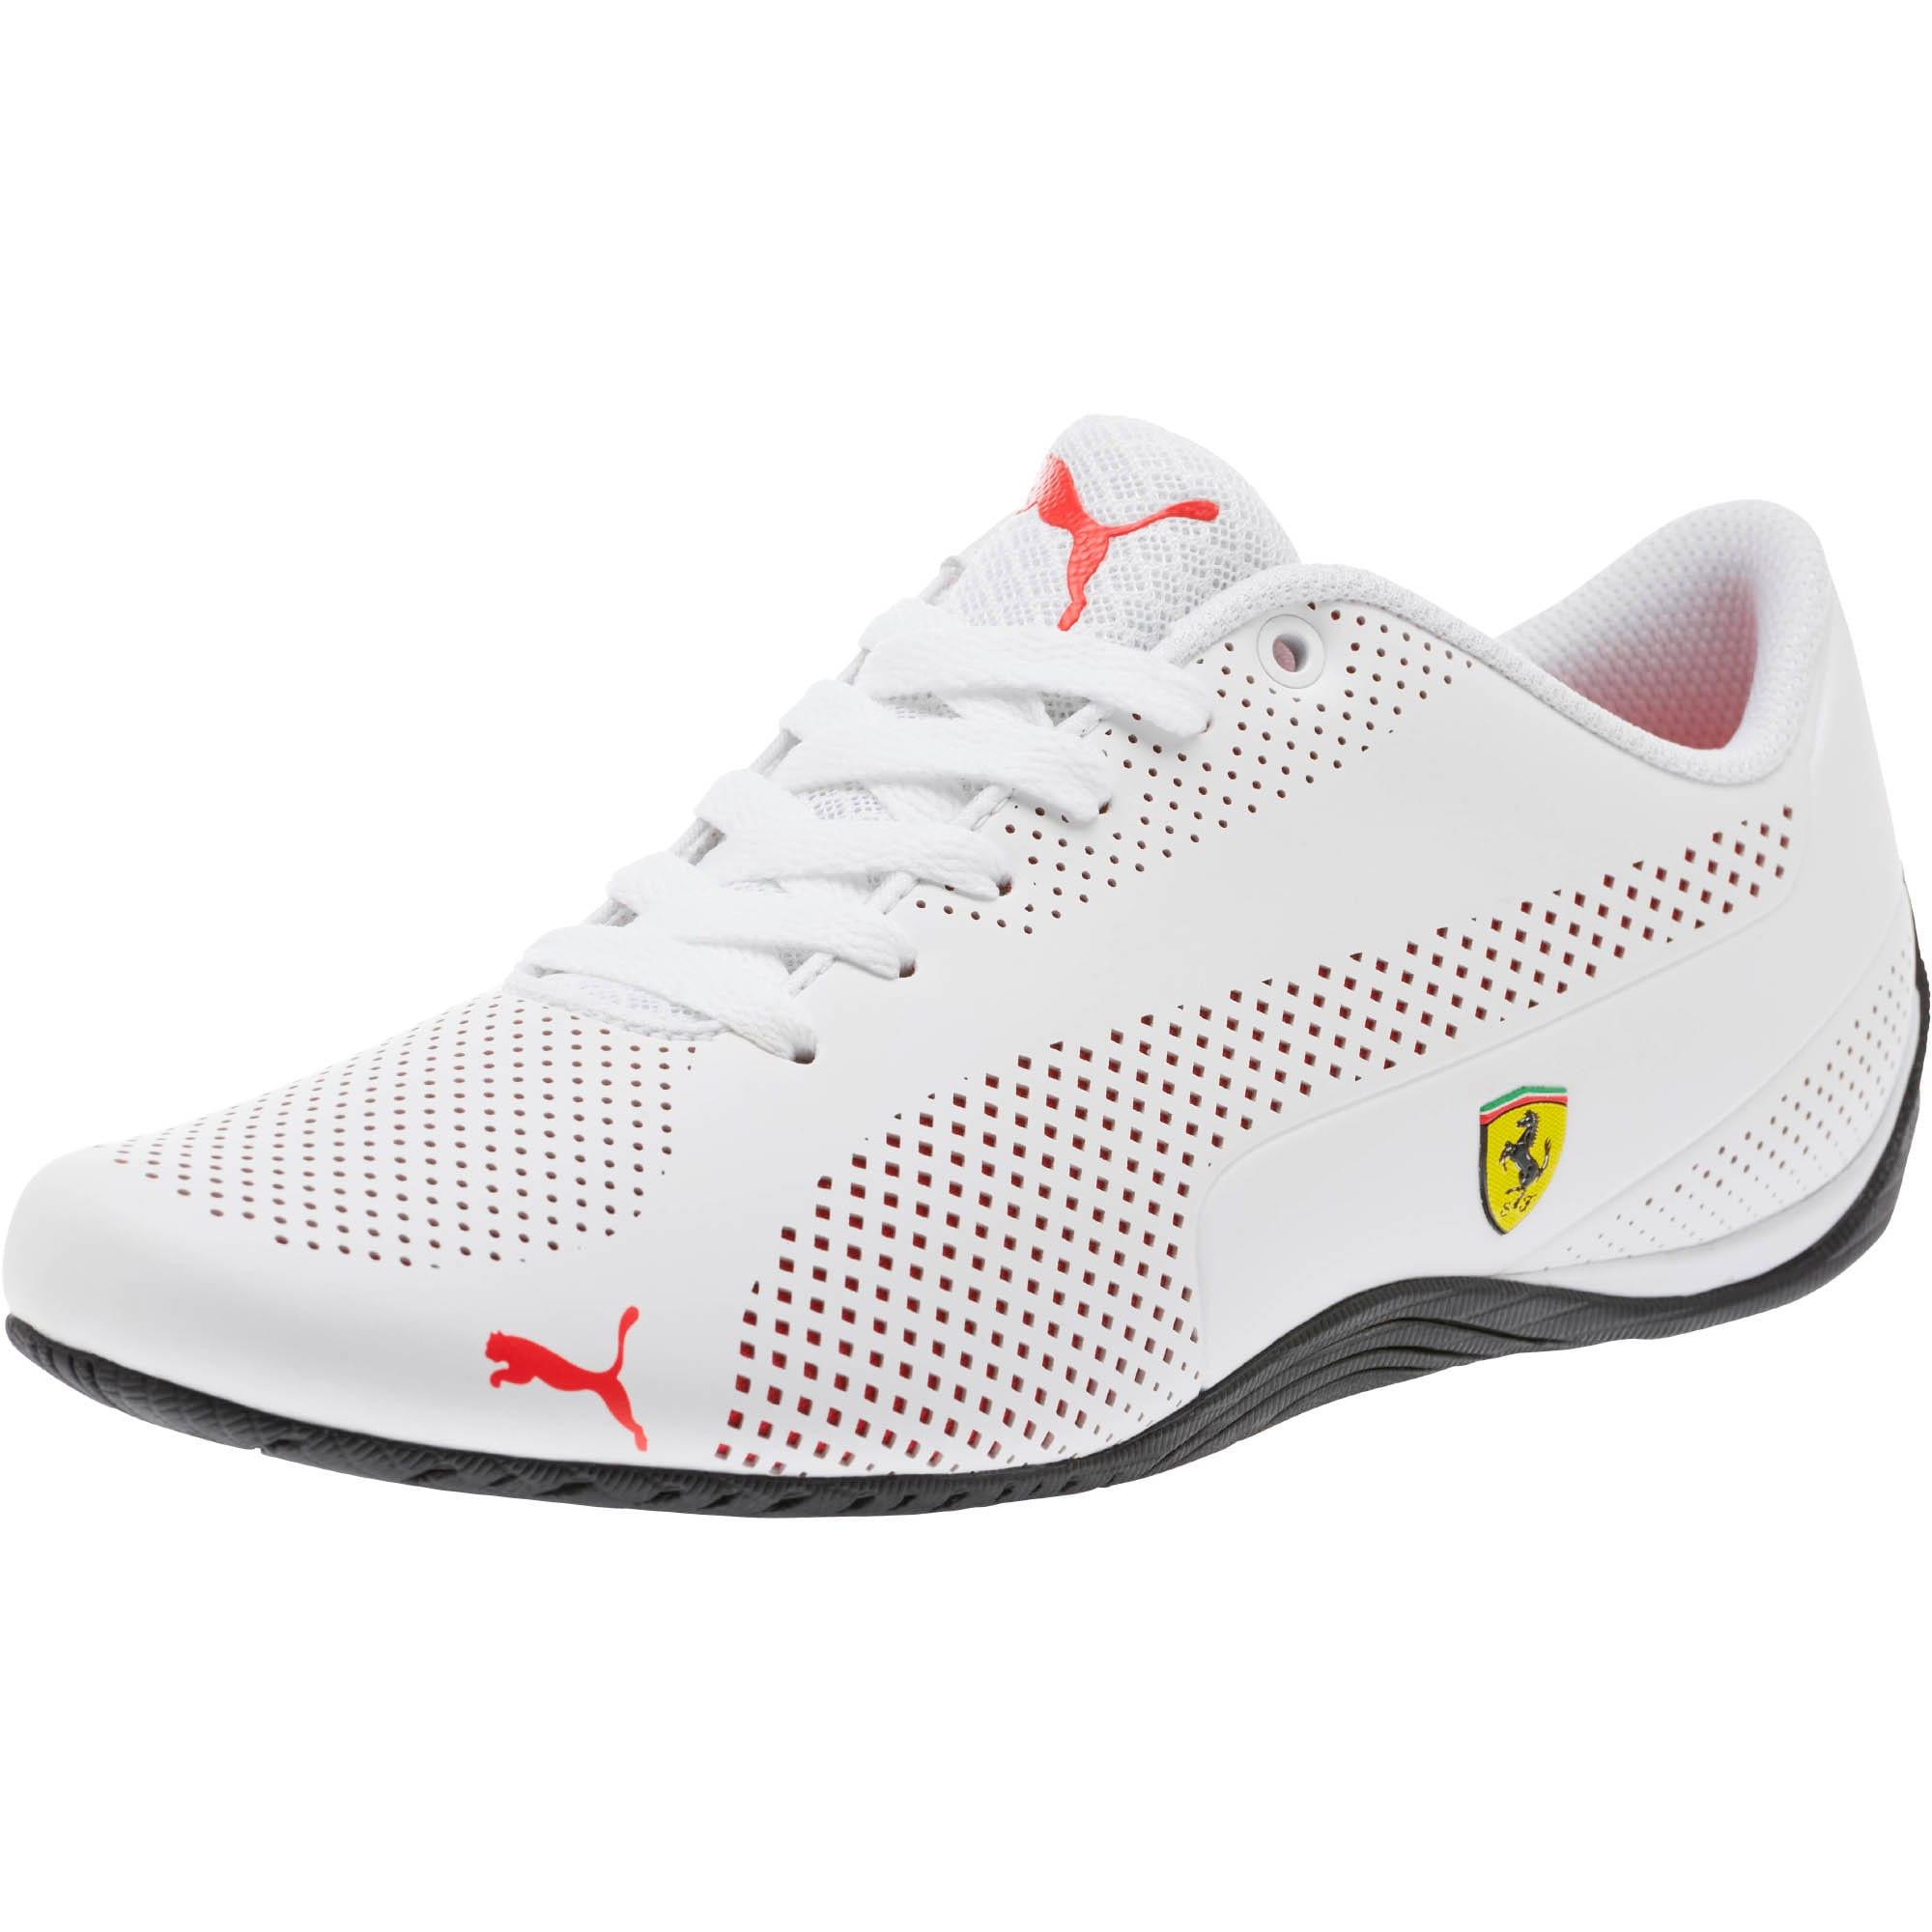 Puma SF Drift Cat 5 Ultra Motorsport Shoes For Men